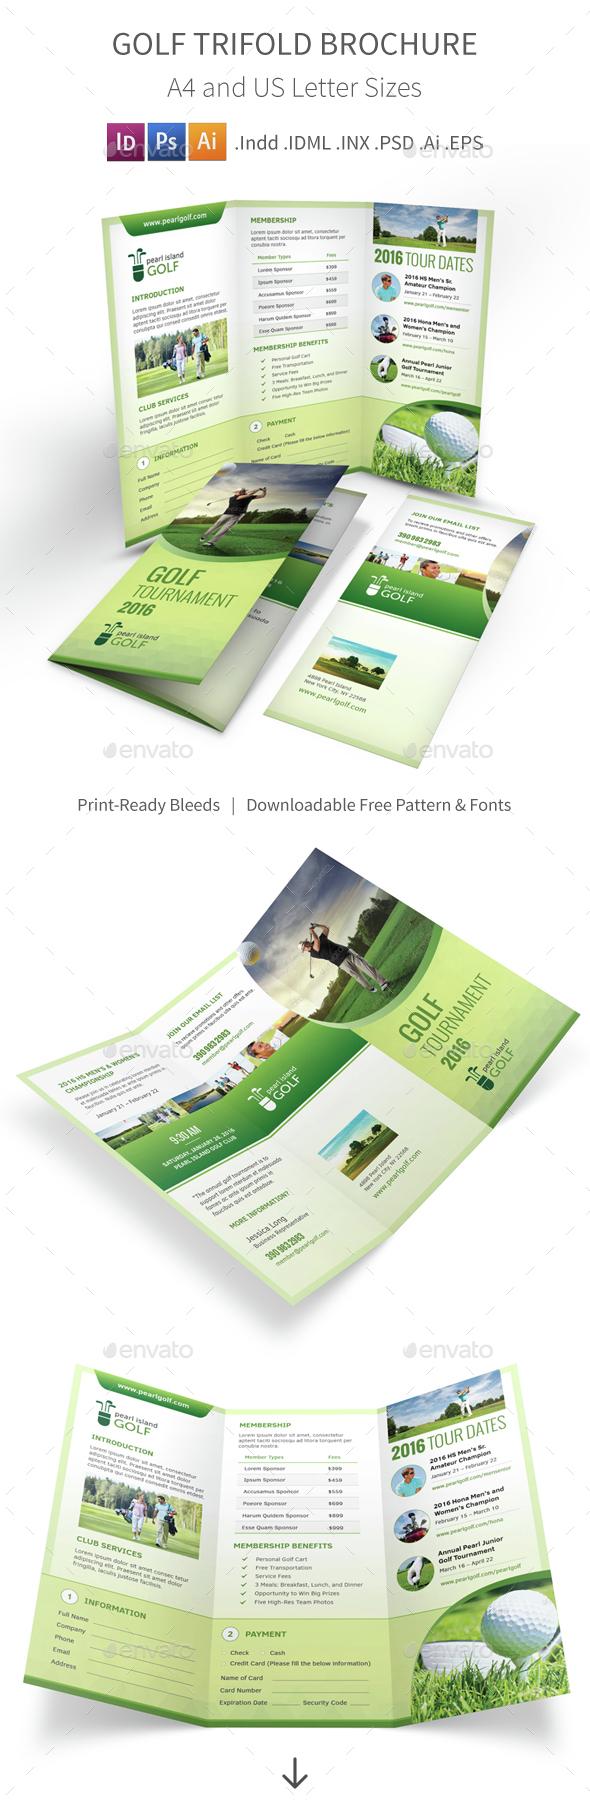 Golf Club Trifold Brochure - Informational Brochures